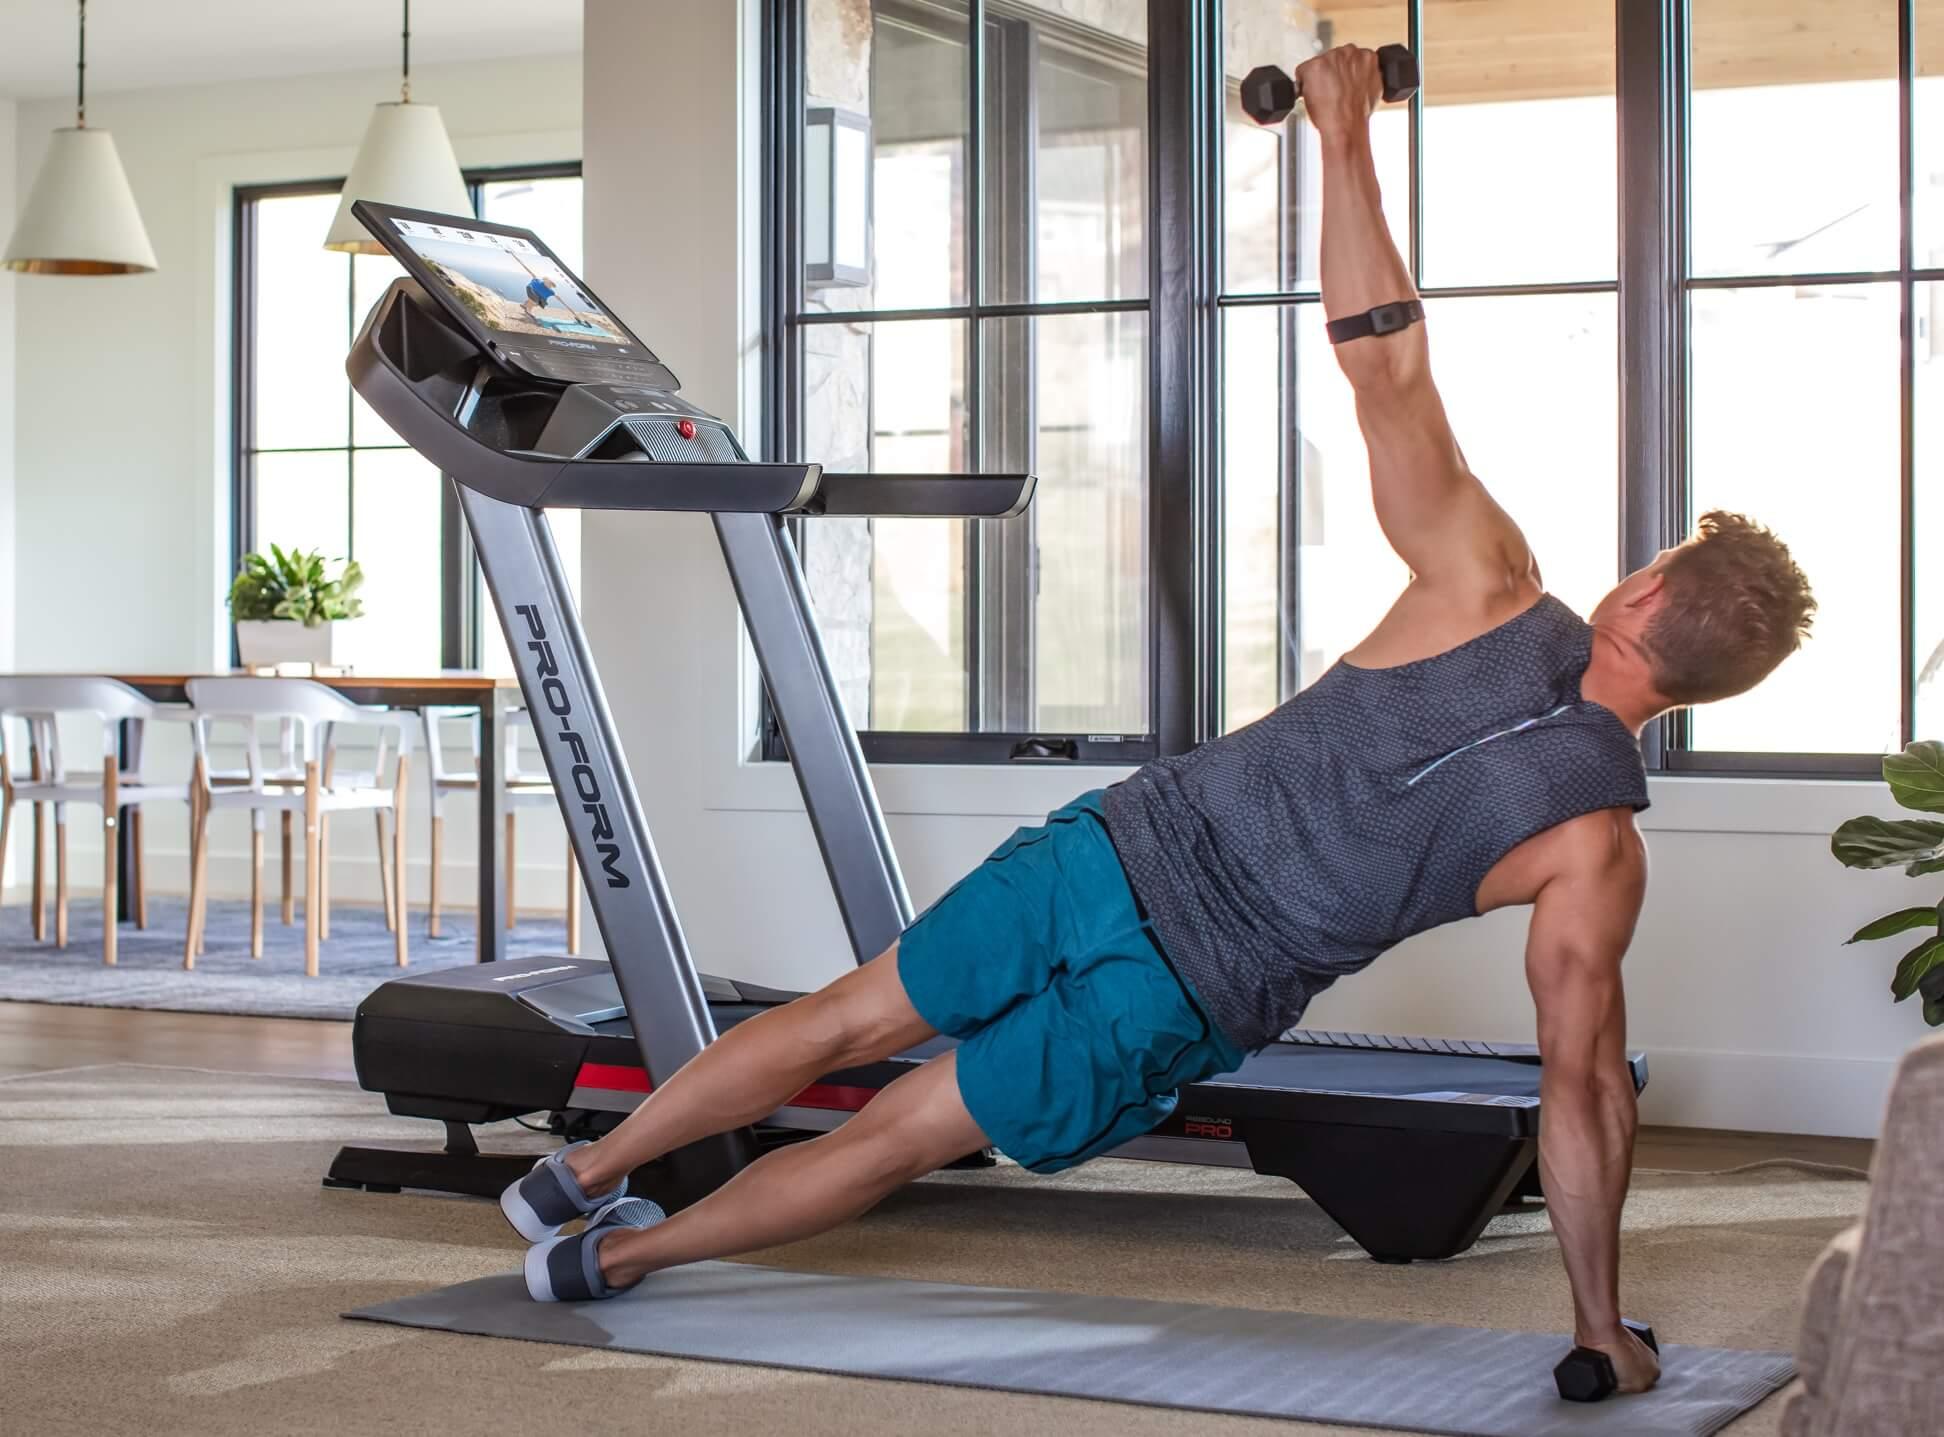 Build upper-body strength.